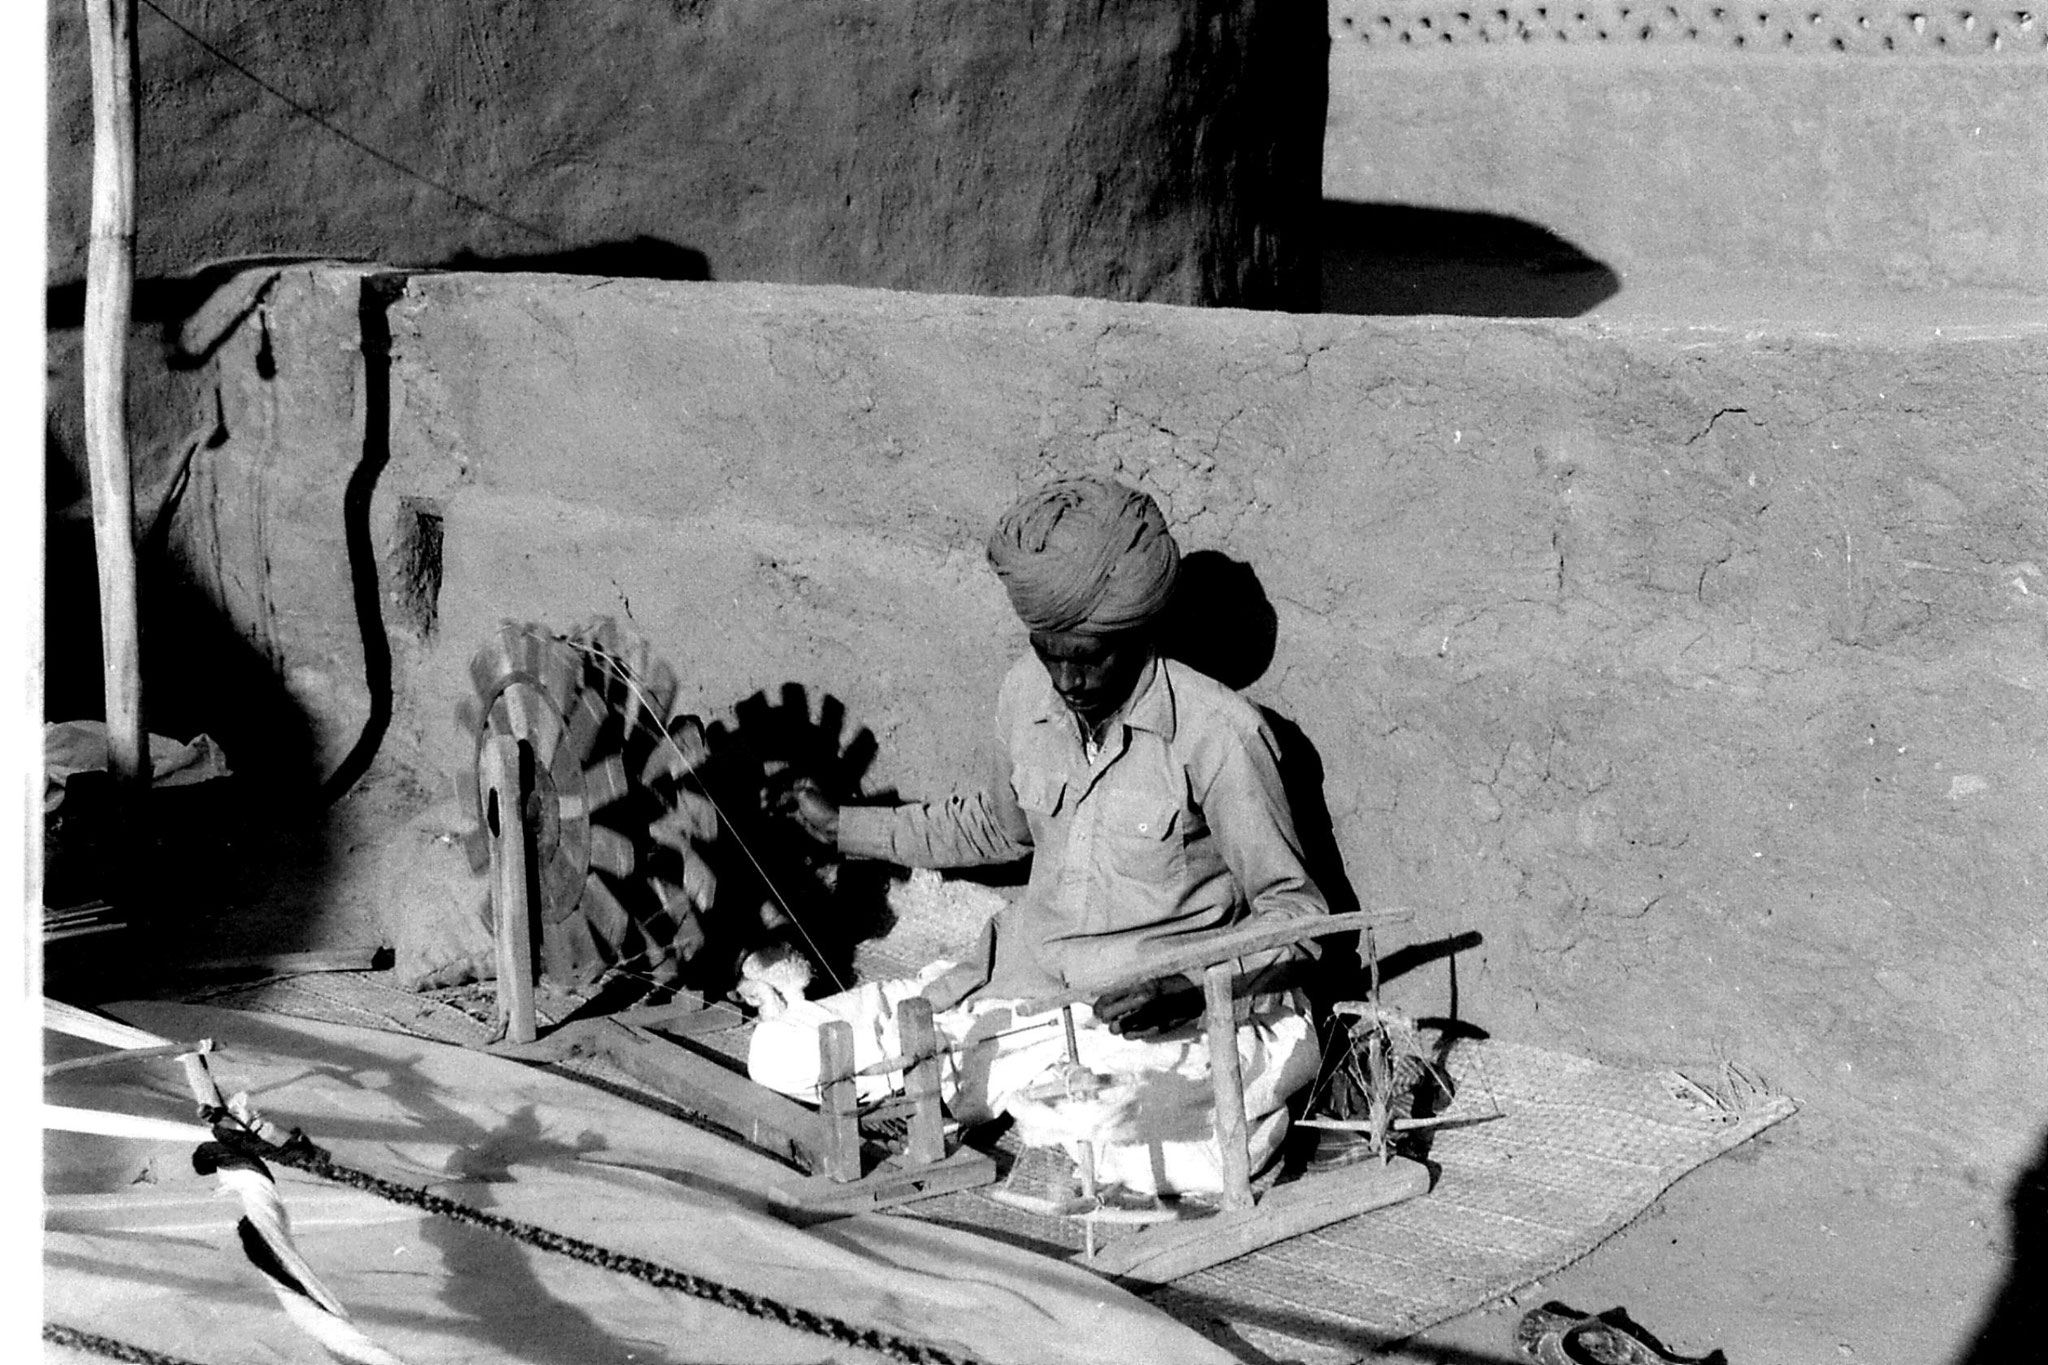 8/12/1989: 15: Udaipur, Shilp Gram Craft Centre